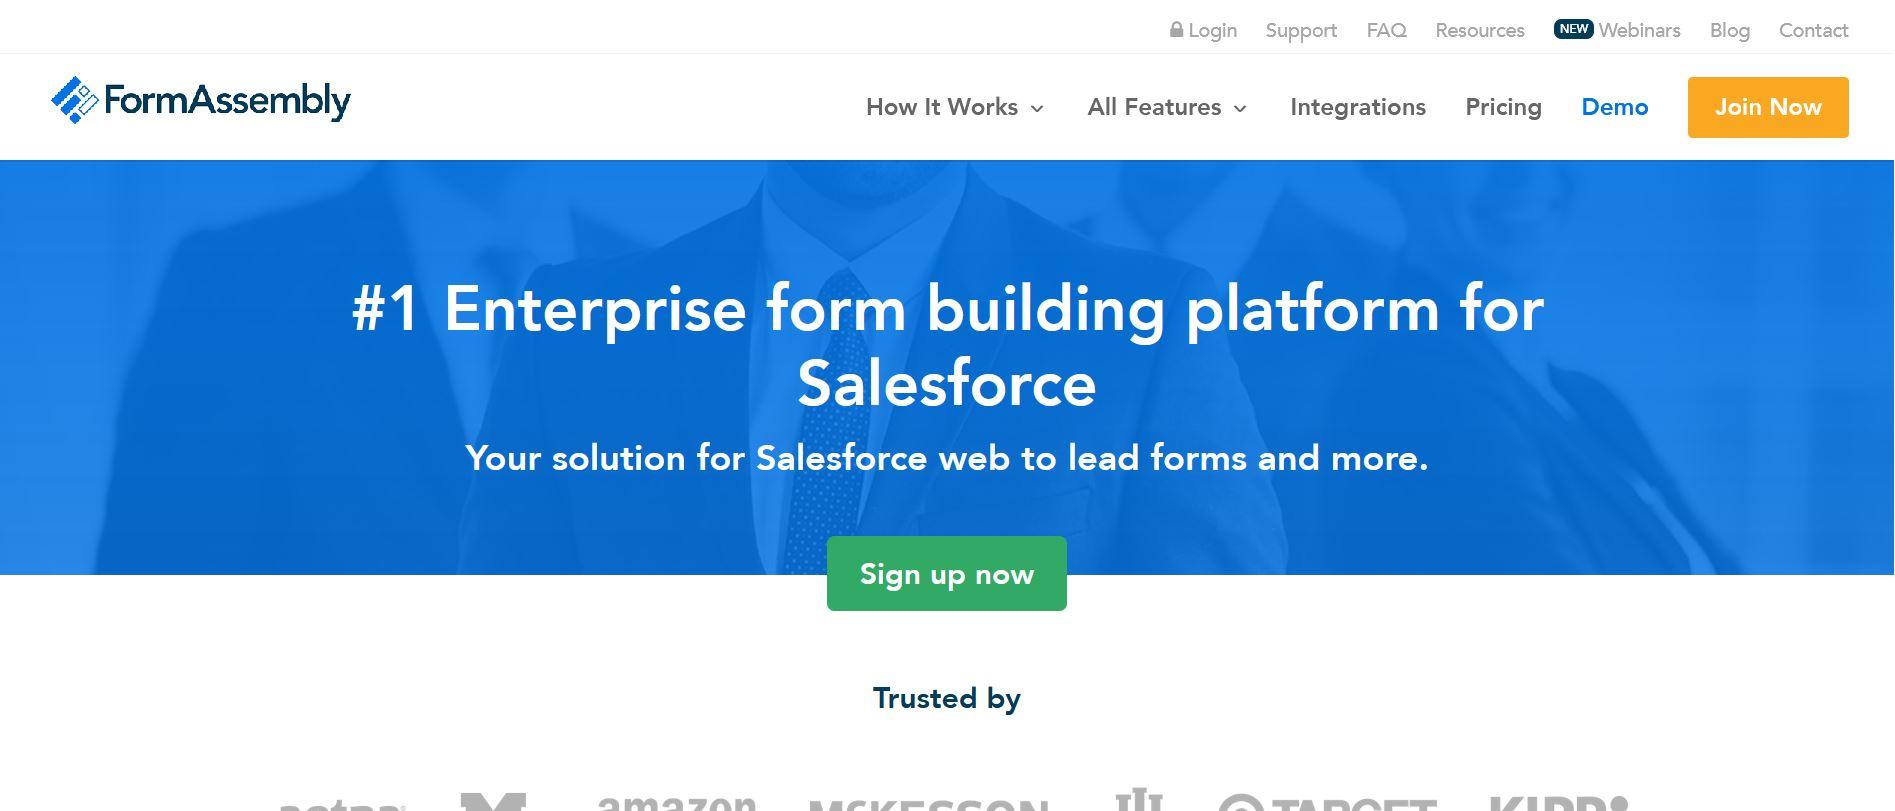 FormAssembly integration Salesforce